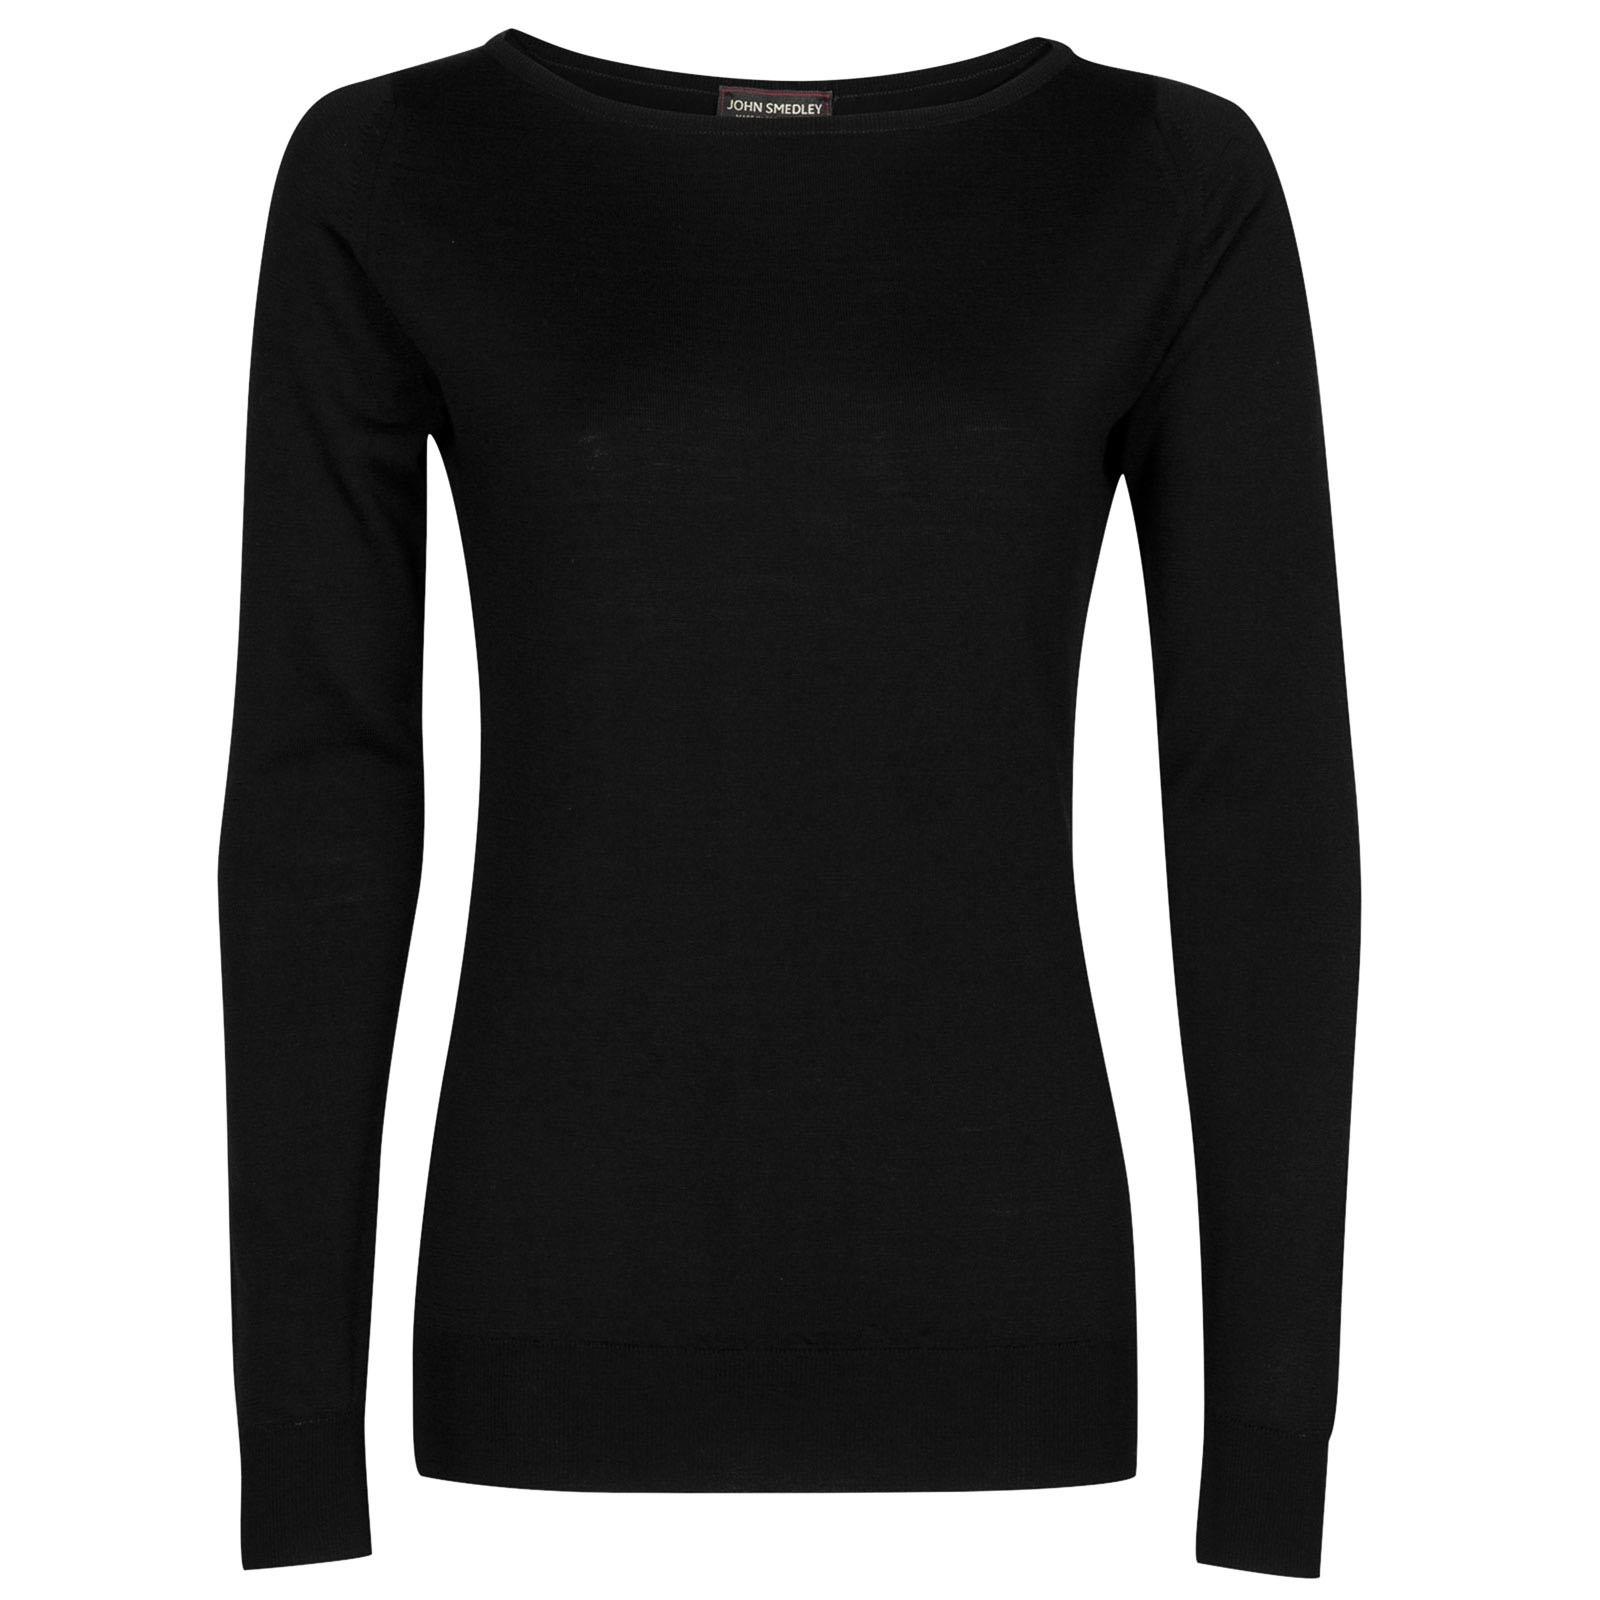 John Smedley susan Merino Wool Sweater in Black-XL